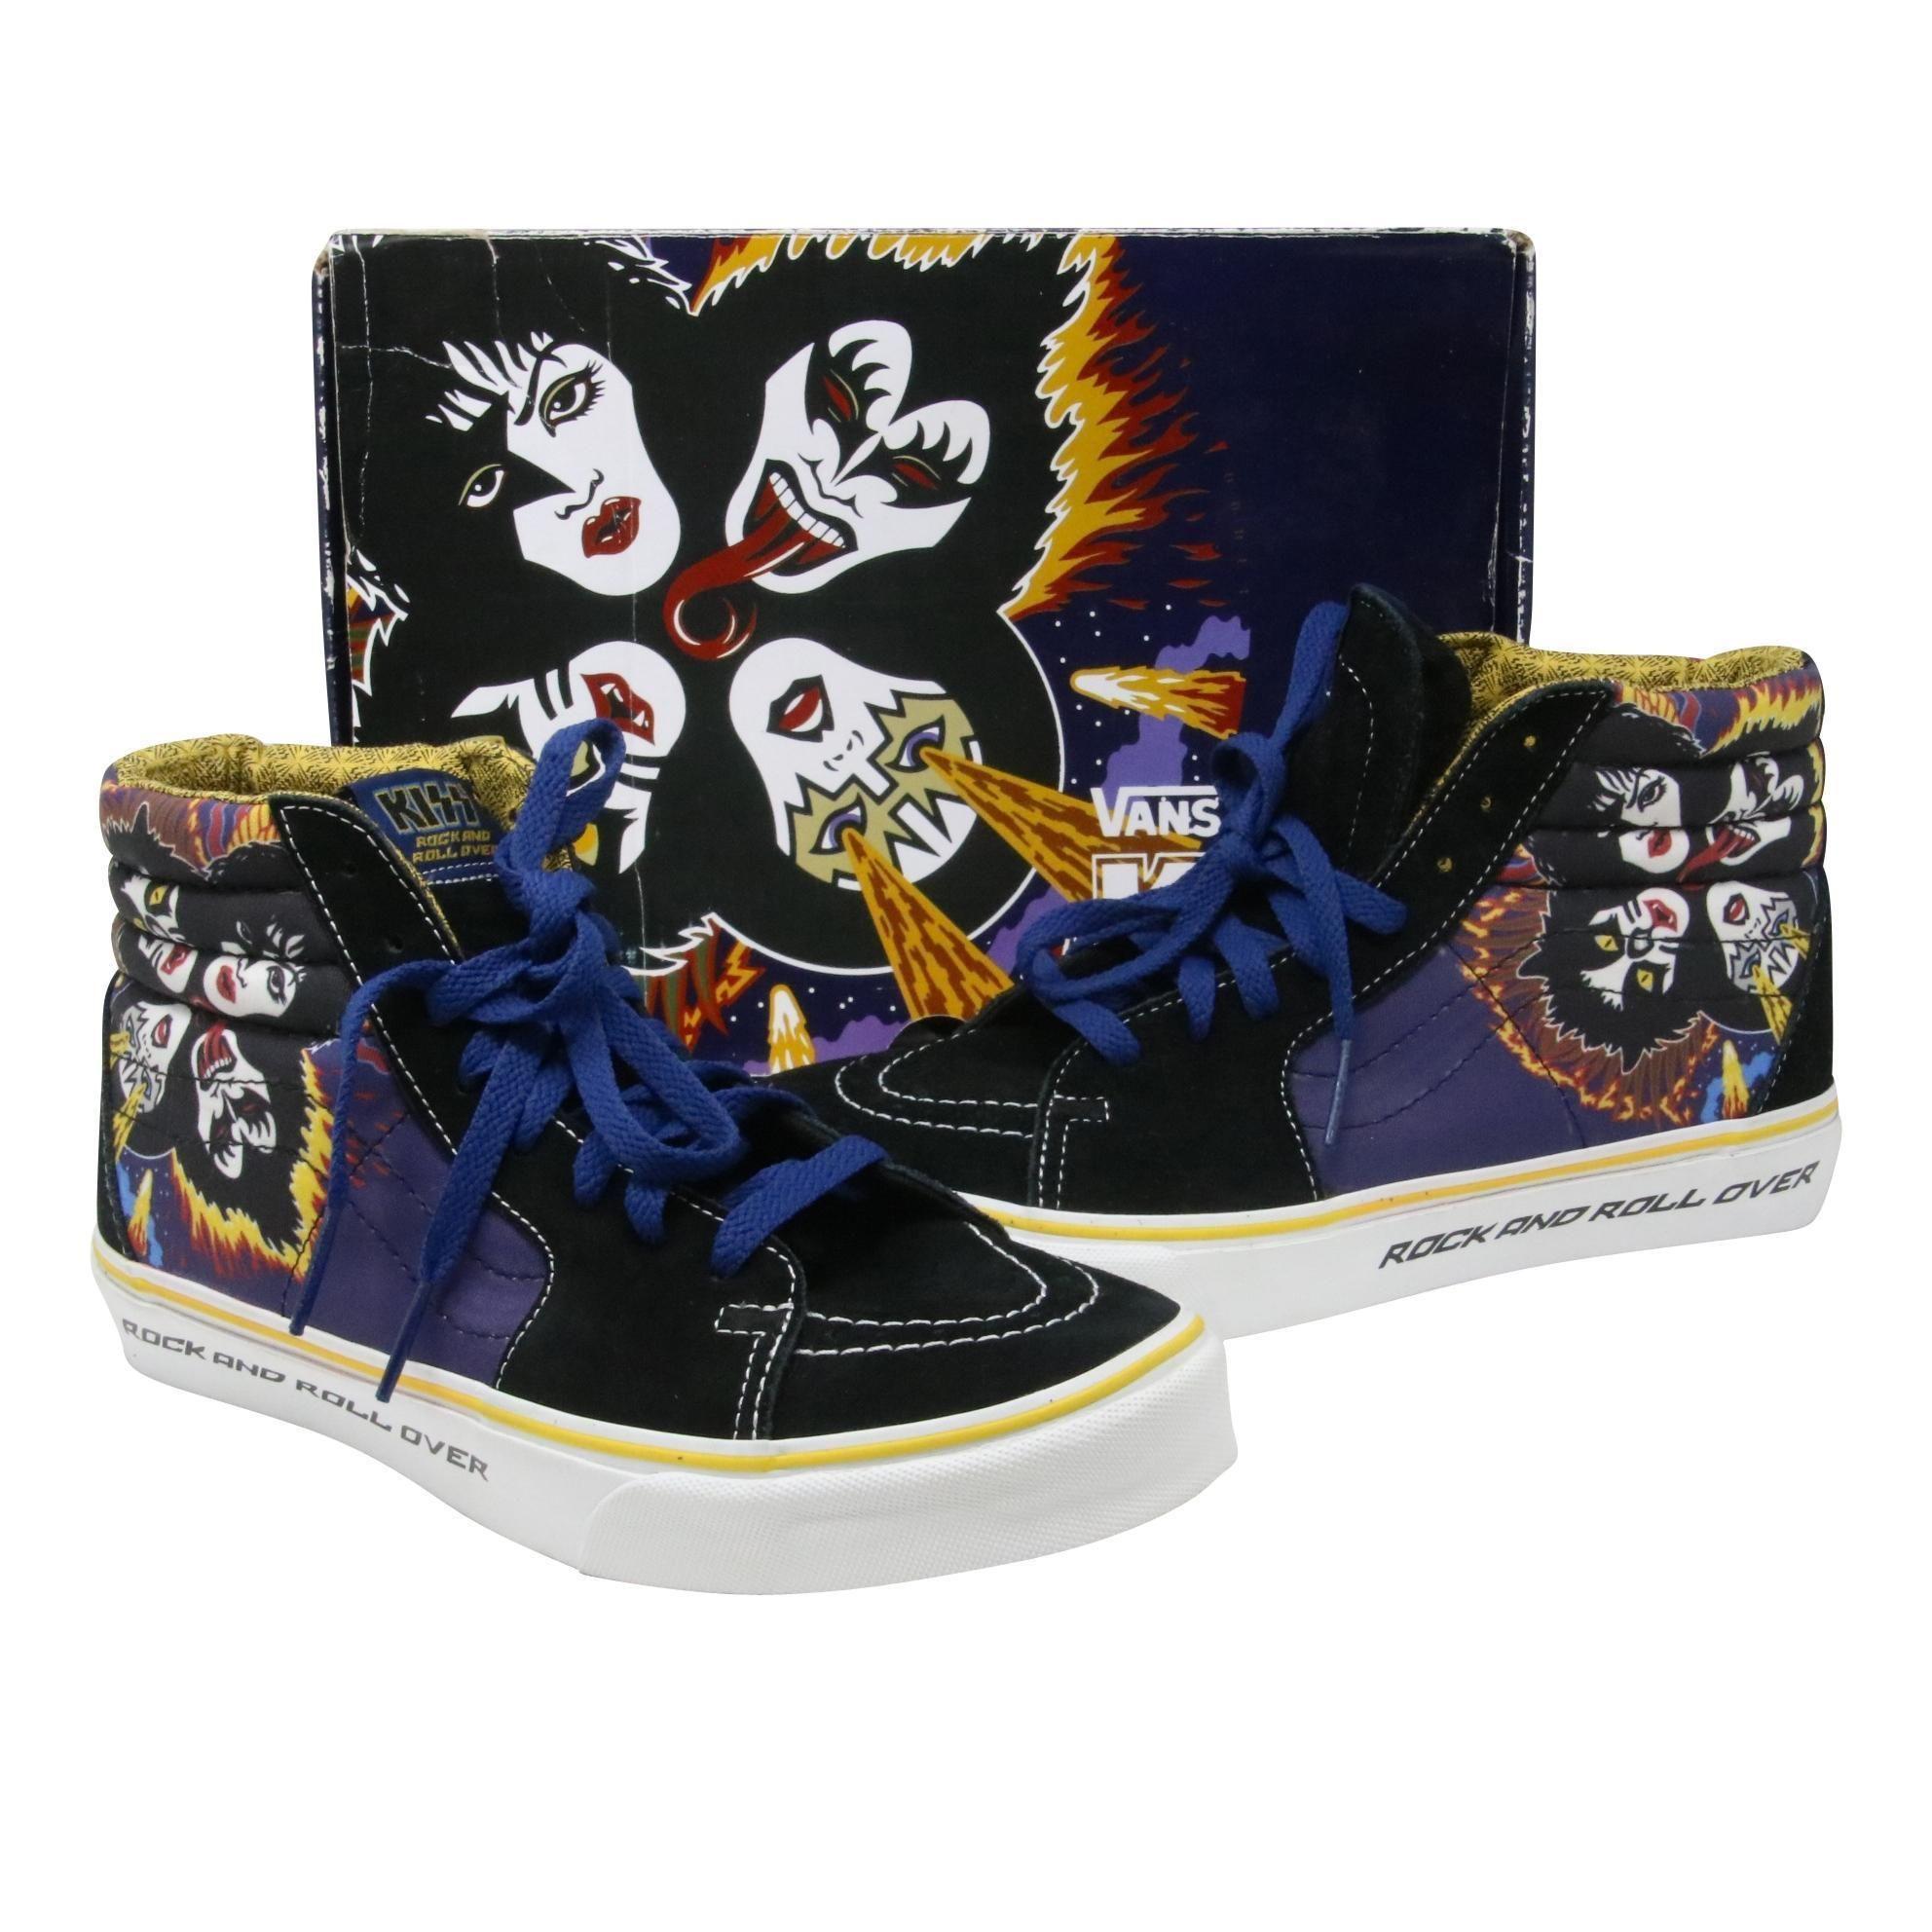 Vans Rock and Roll Over Sk8 HI (Hi Top Sneakers) – KISS